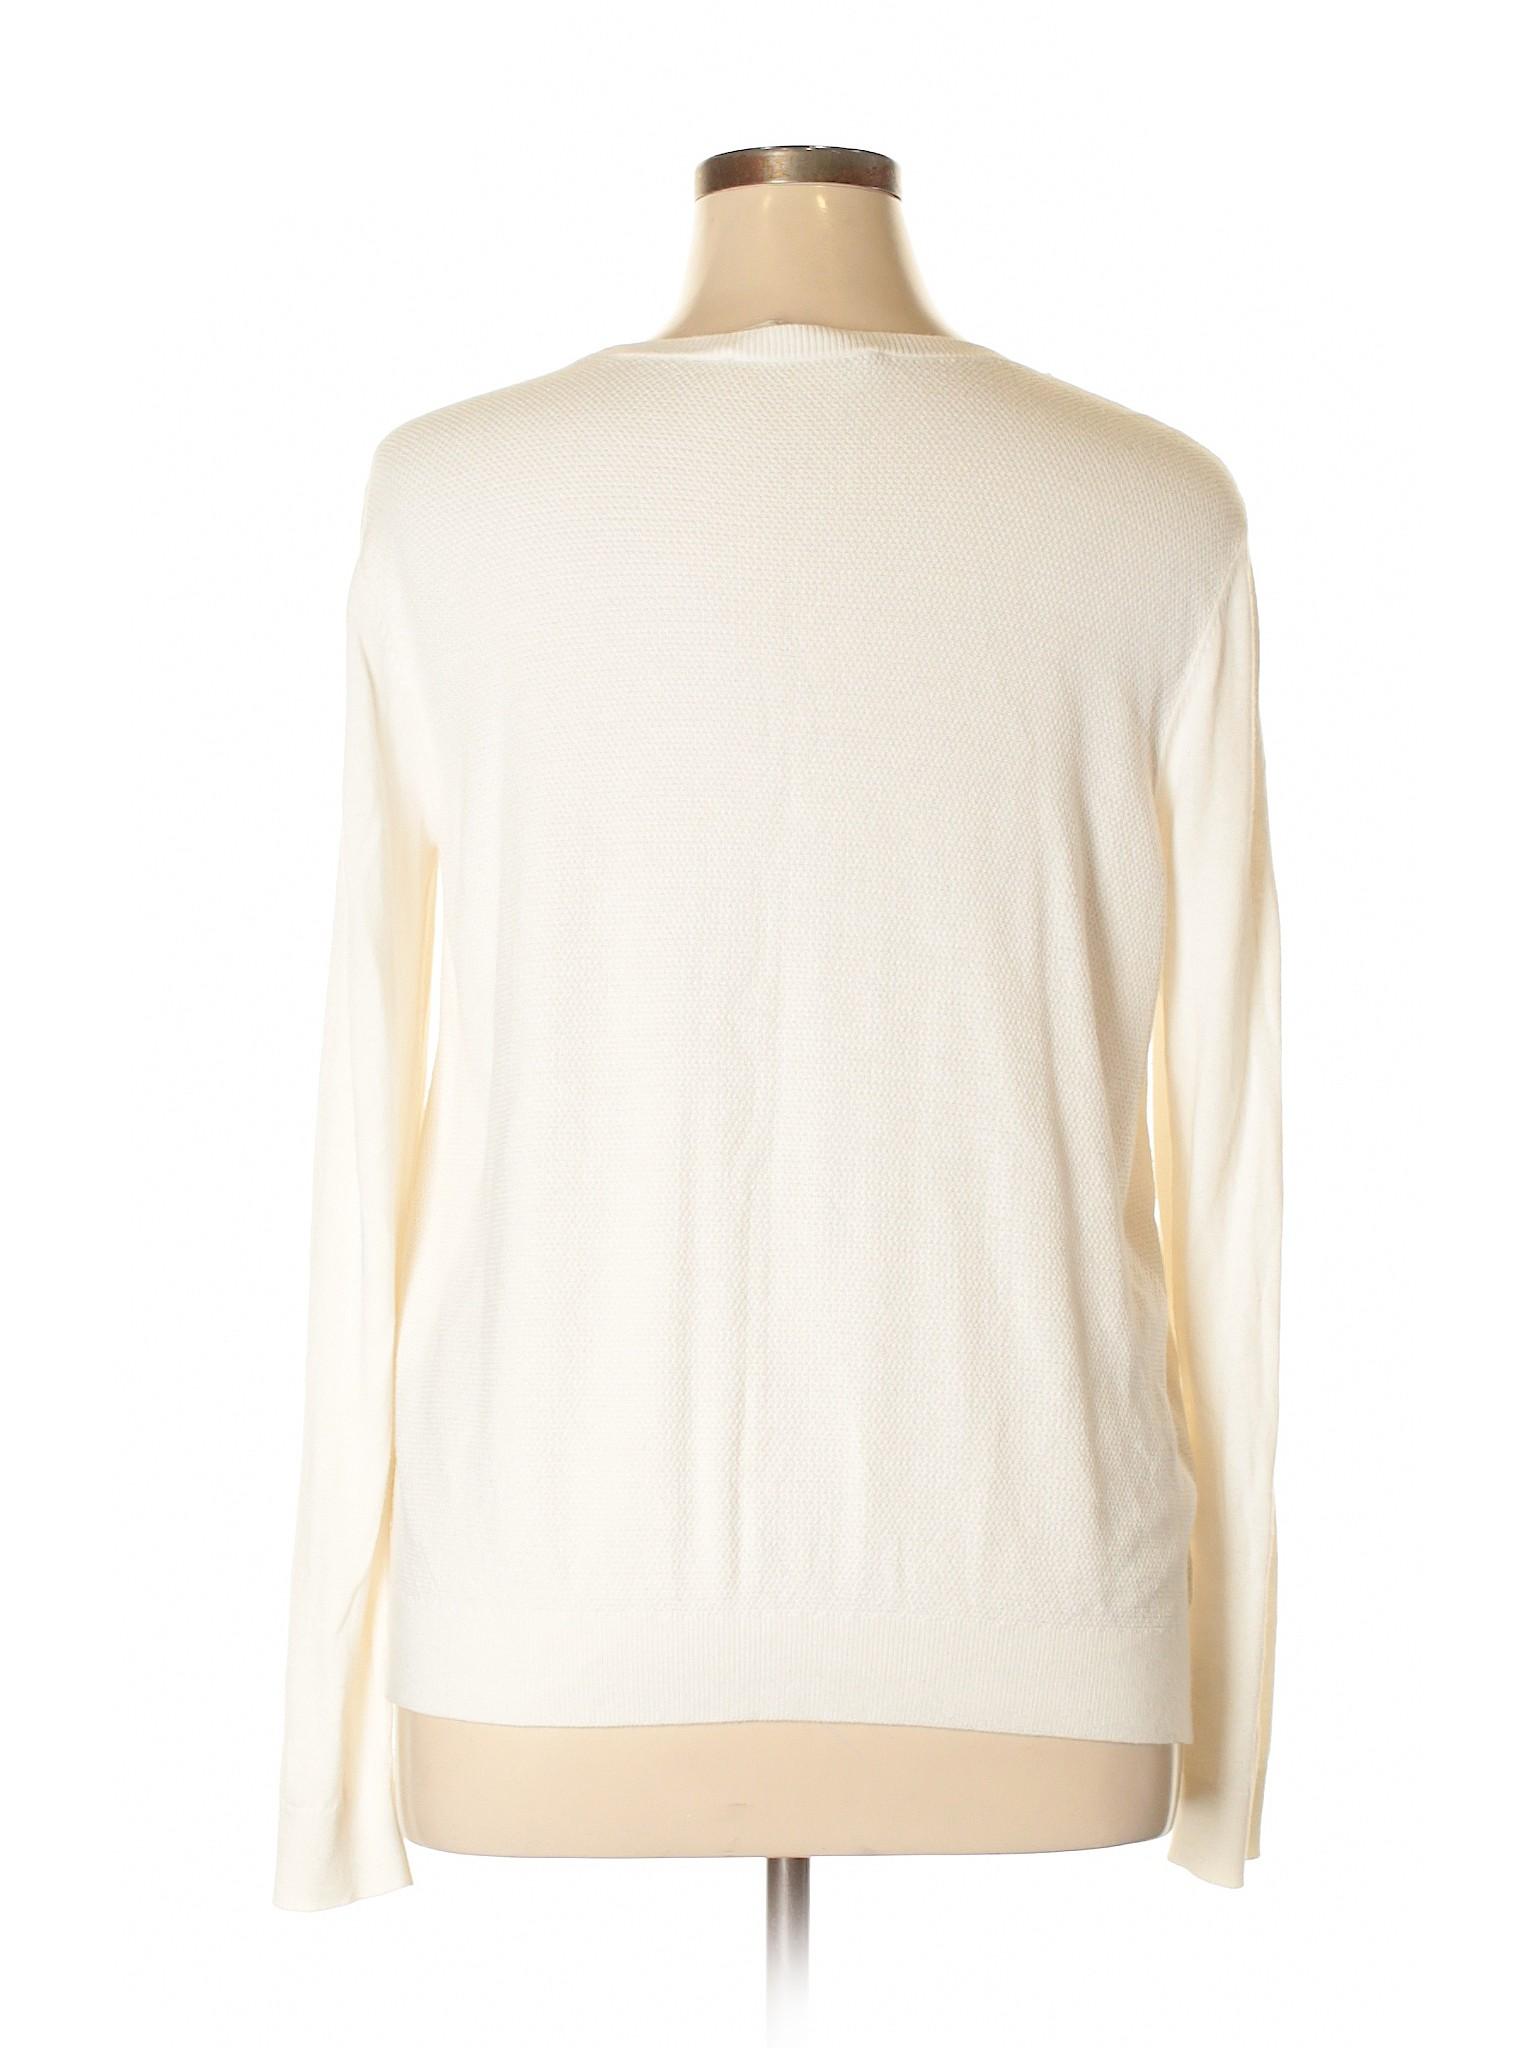 Ann Taylor Pullover Boutique Sweater LOFT qF68q0YH